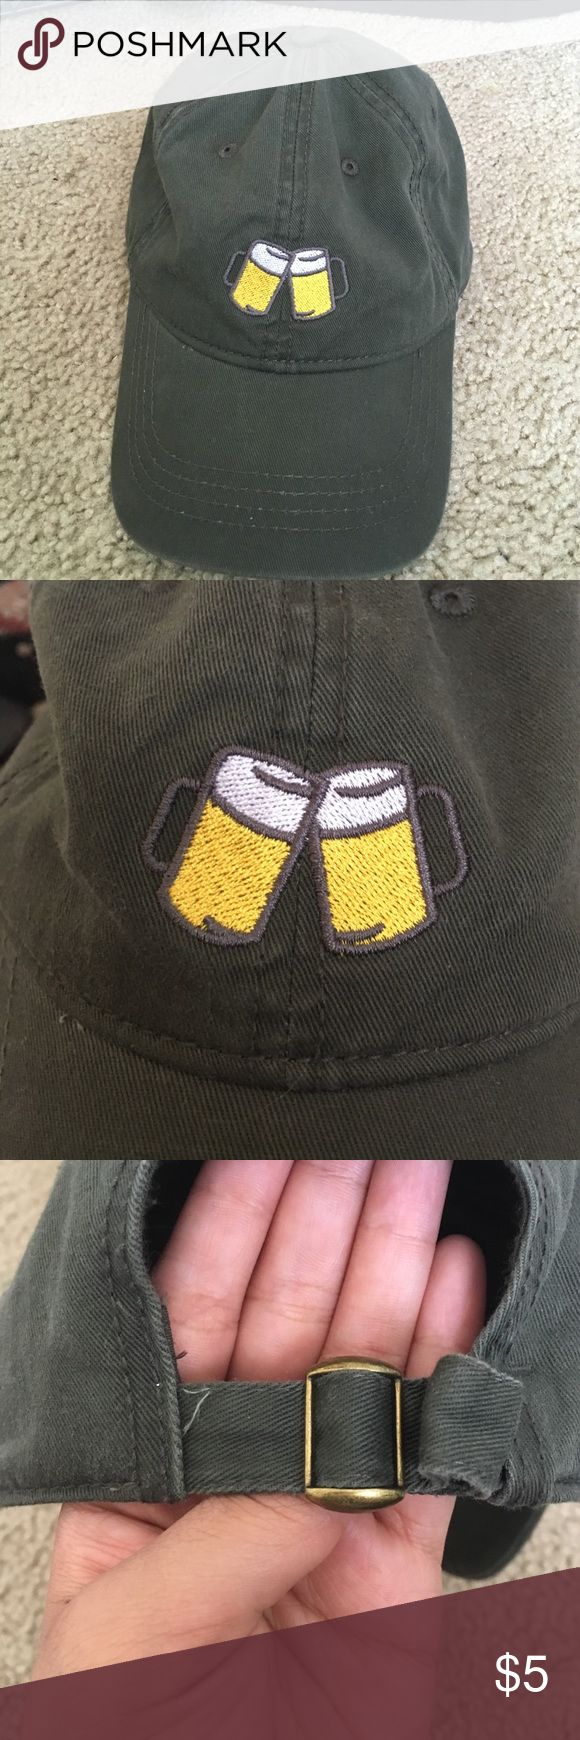 carbon elements beer mugs dad hat 100% cotton baseball cap Accessories Hats